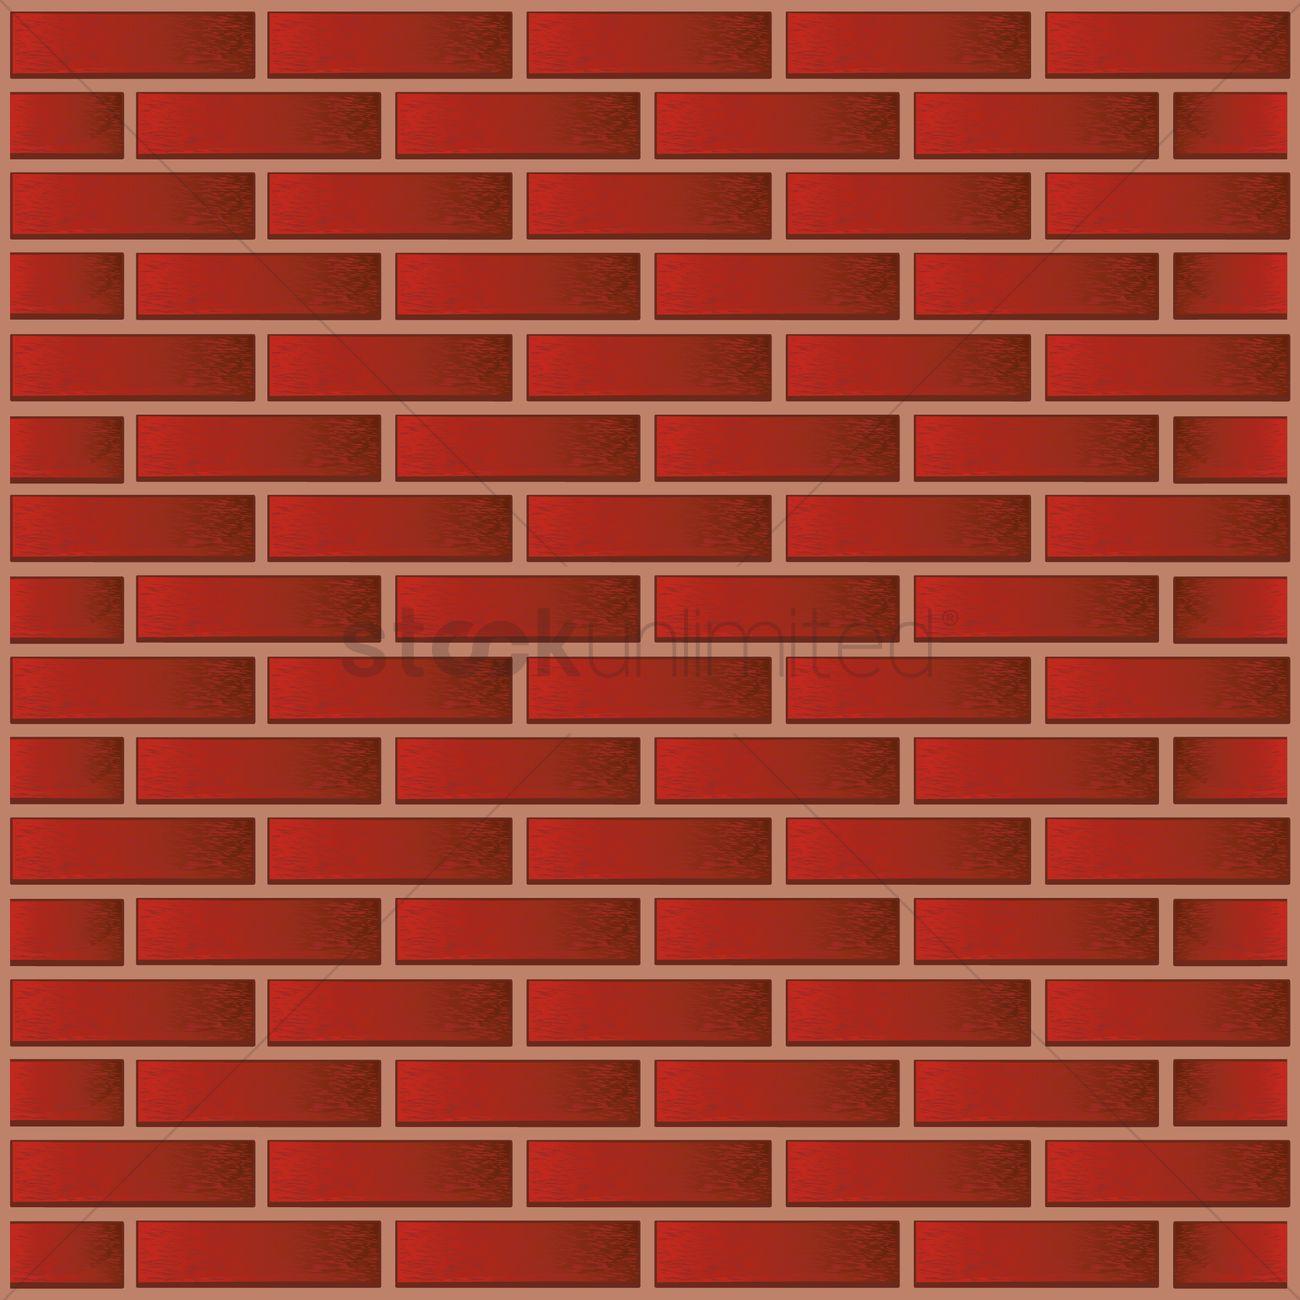 Brick wall Vector Image - 1441018 | StockUnlimited